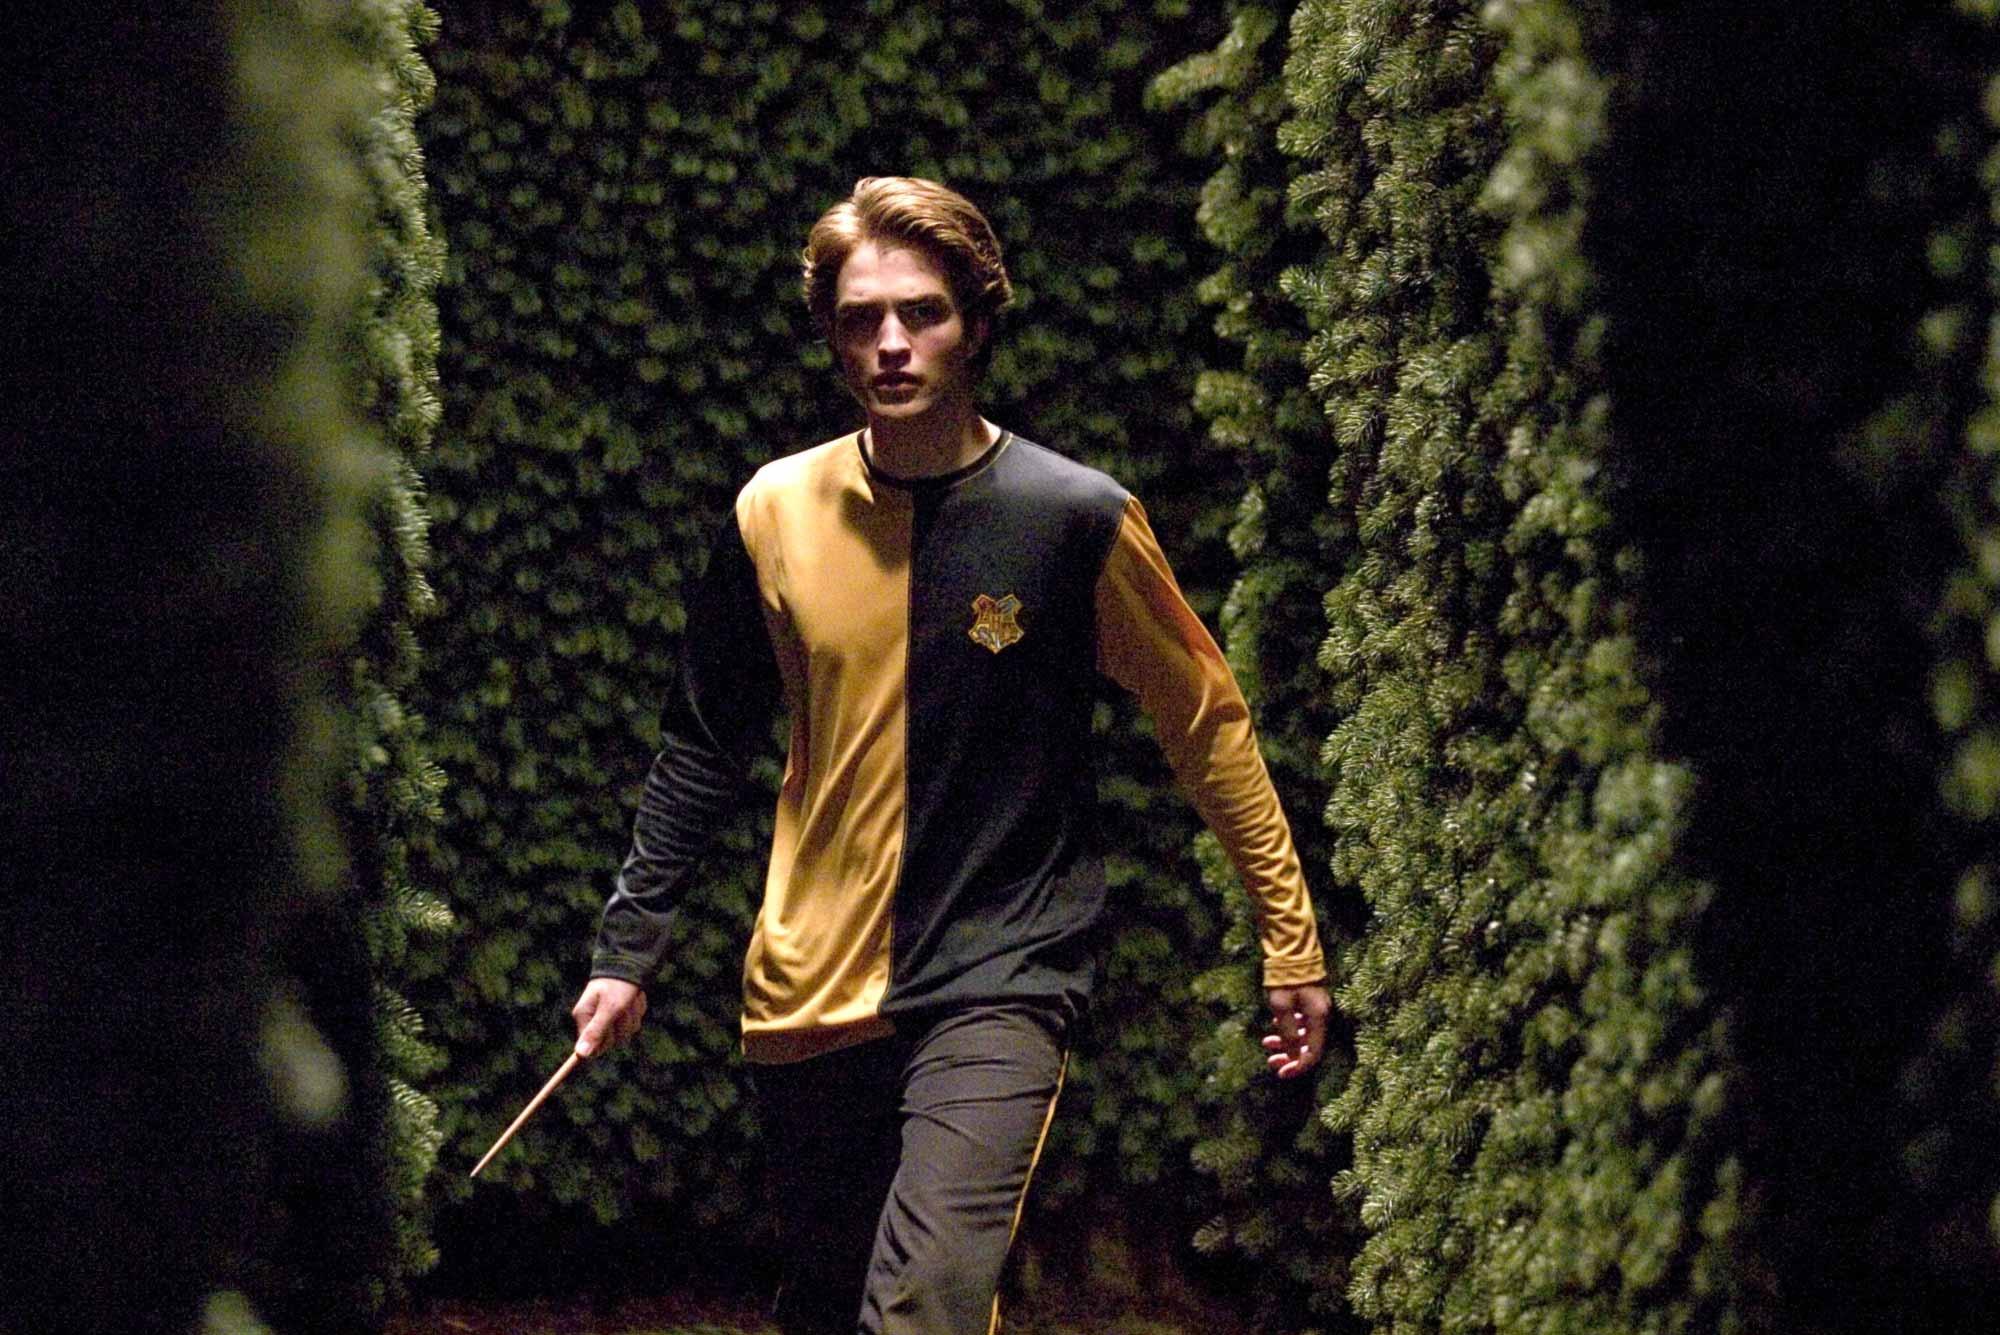 24 juin wiki harry potter fandom powered by wikia - Harry potter et la coupe de feu cedric diggory ...